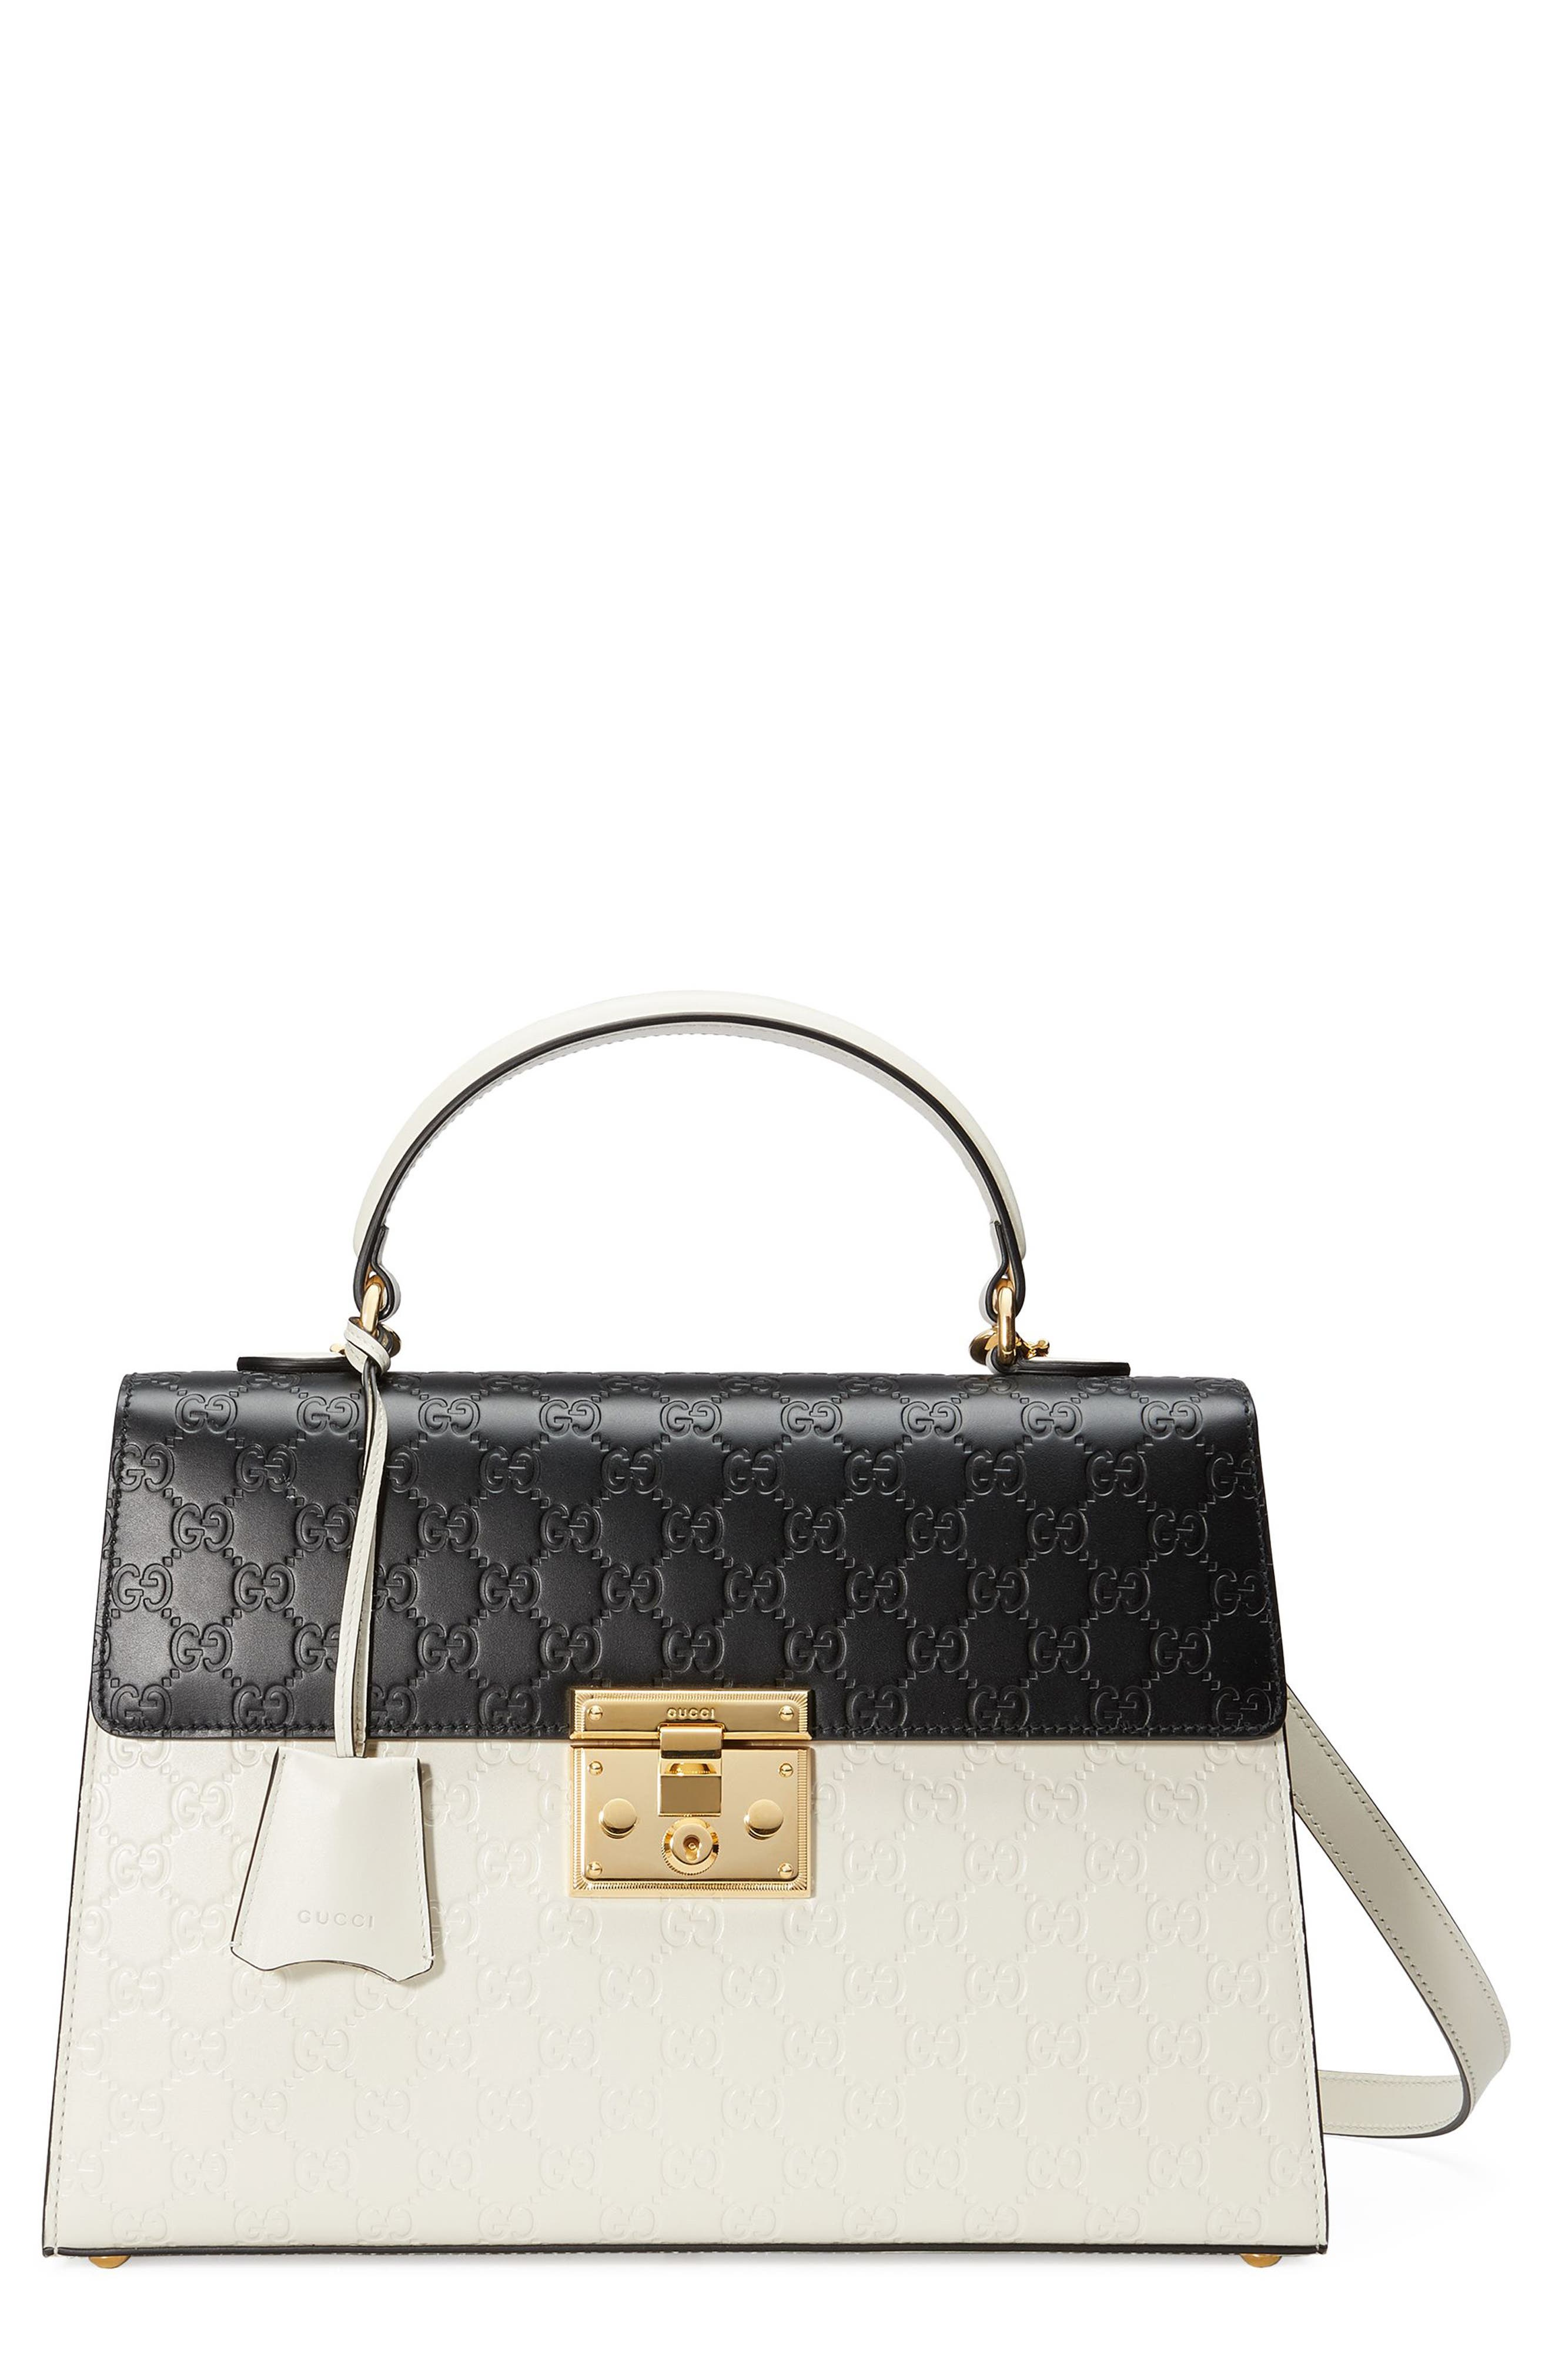 Alternate Image 1 Selected - Gucci Medium Padlock Top Handles Signature Leather Satchel